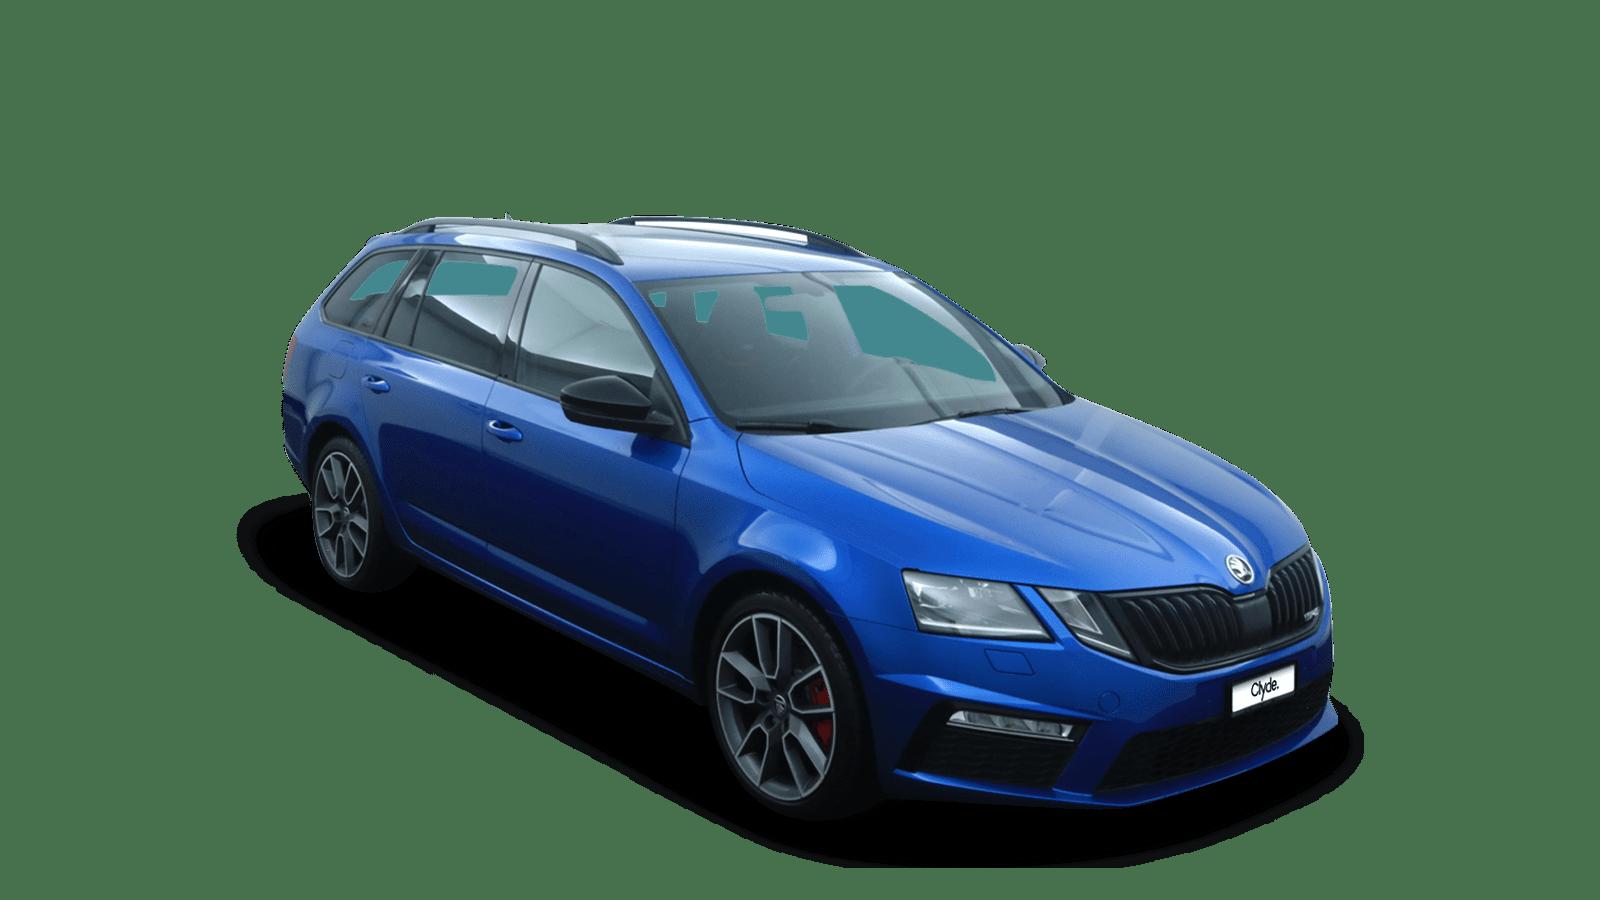 ŠKODA Octavia Combi RS Blue front - Clyde car subscription